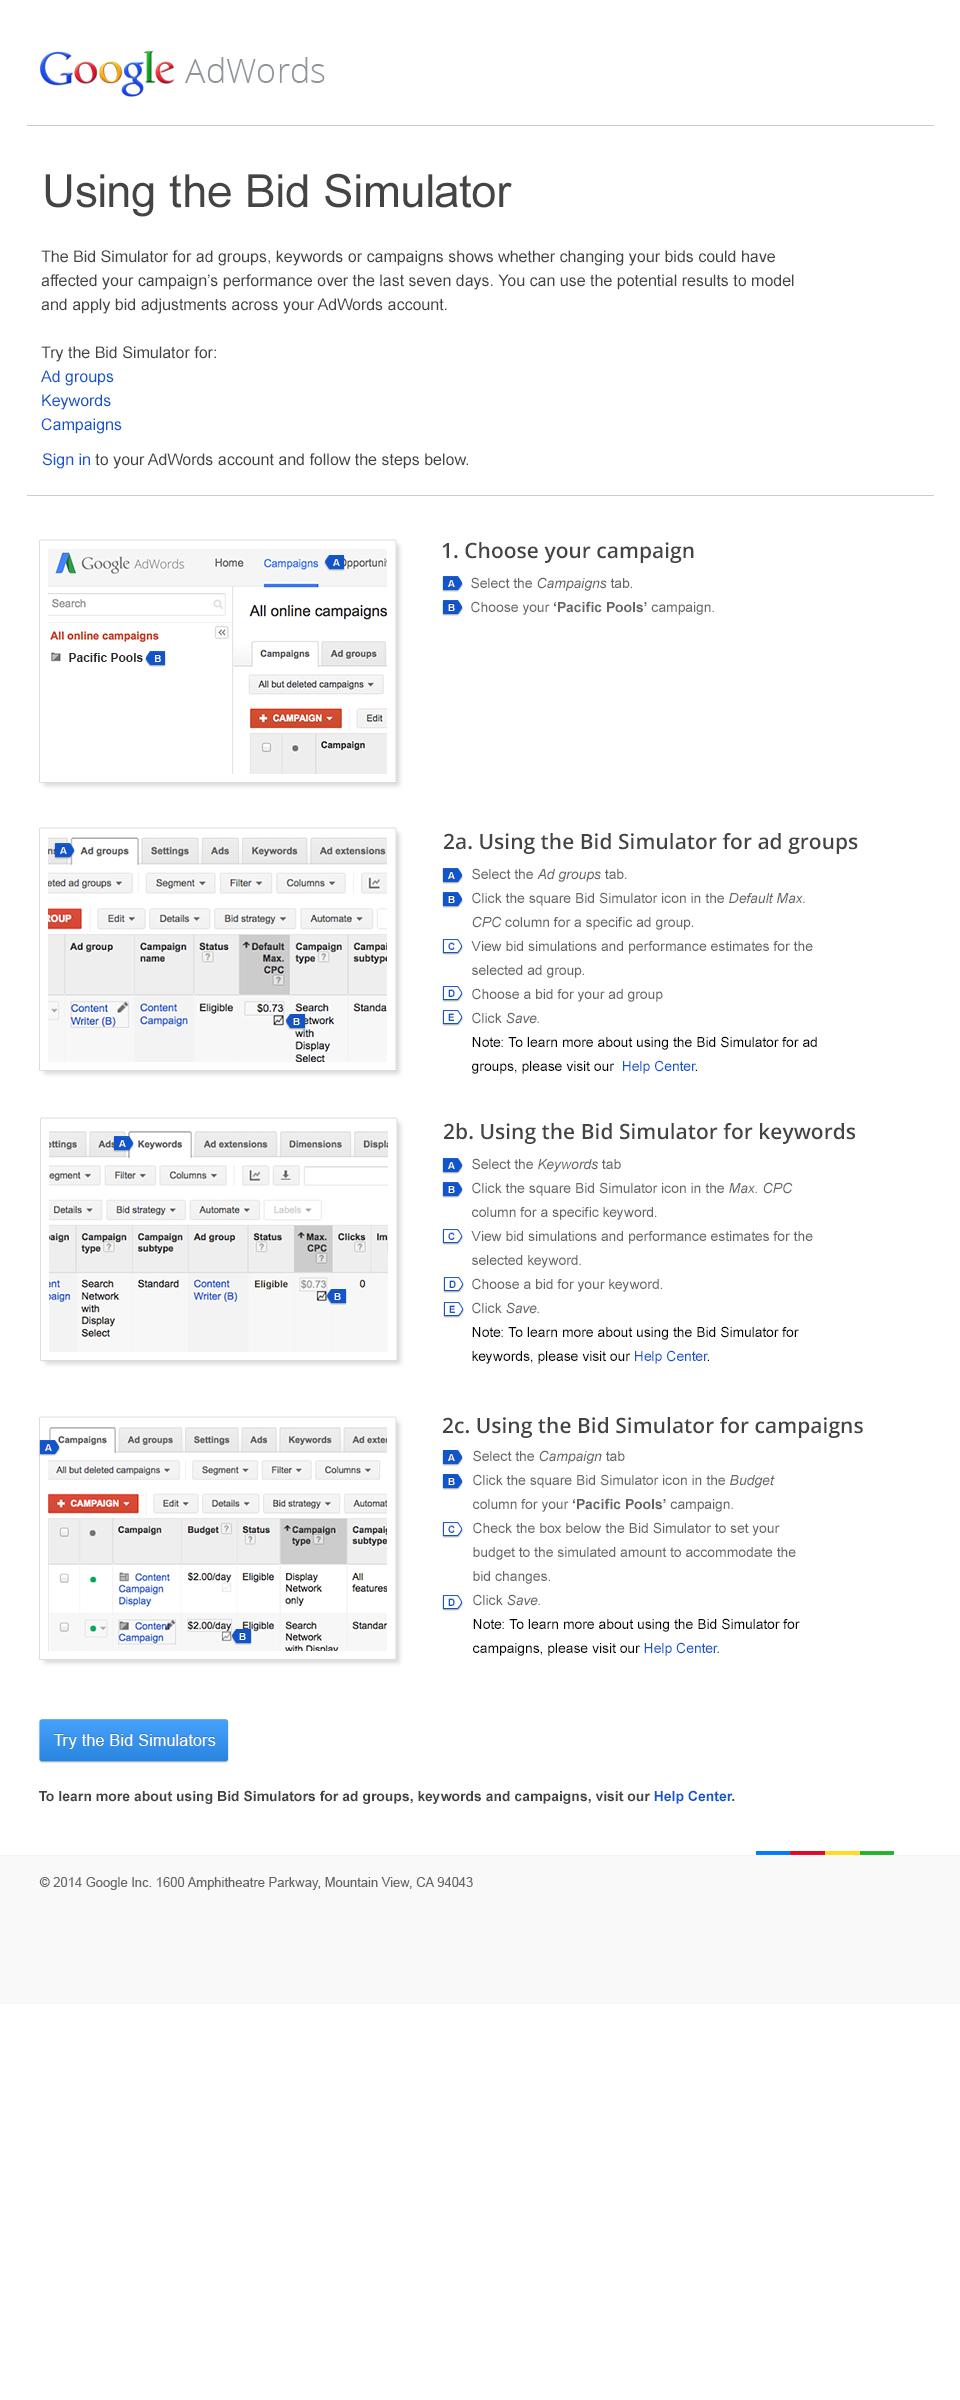 Boe Gatiss - AdWords Bid Simulator Landing Page for Google